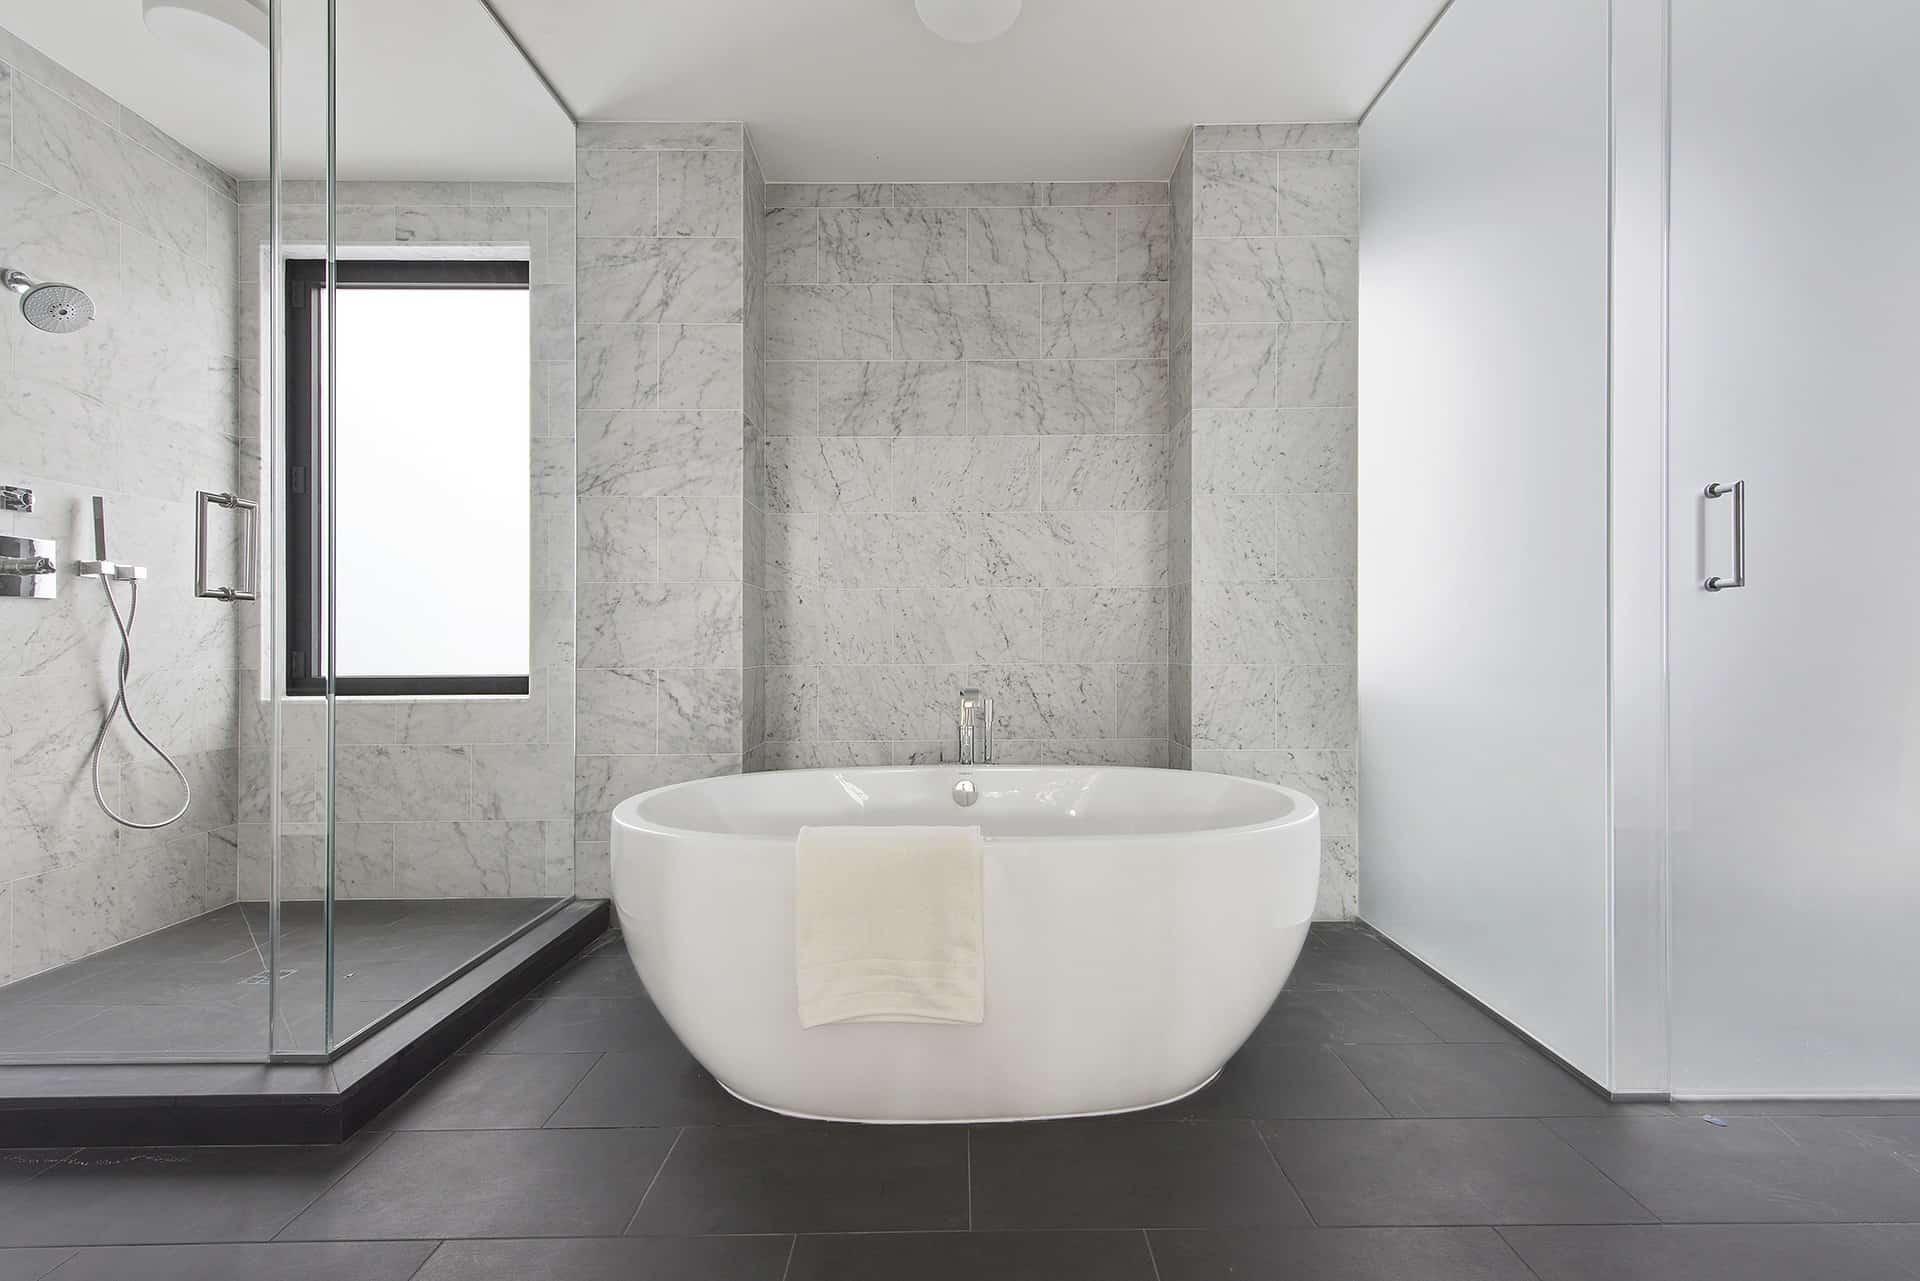 Minimalist-Penthouse-New York-09-1 Kindesign